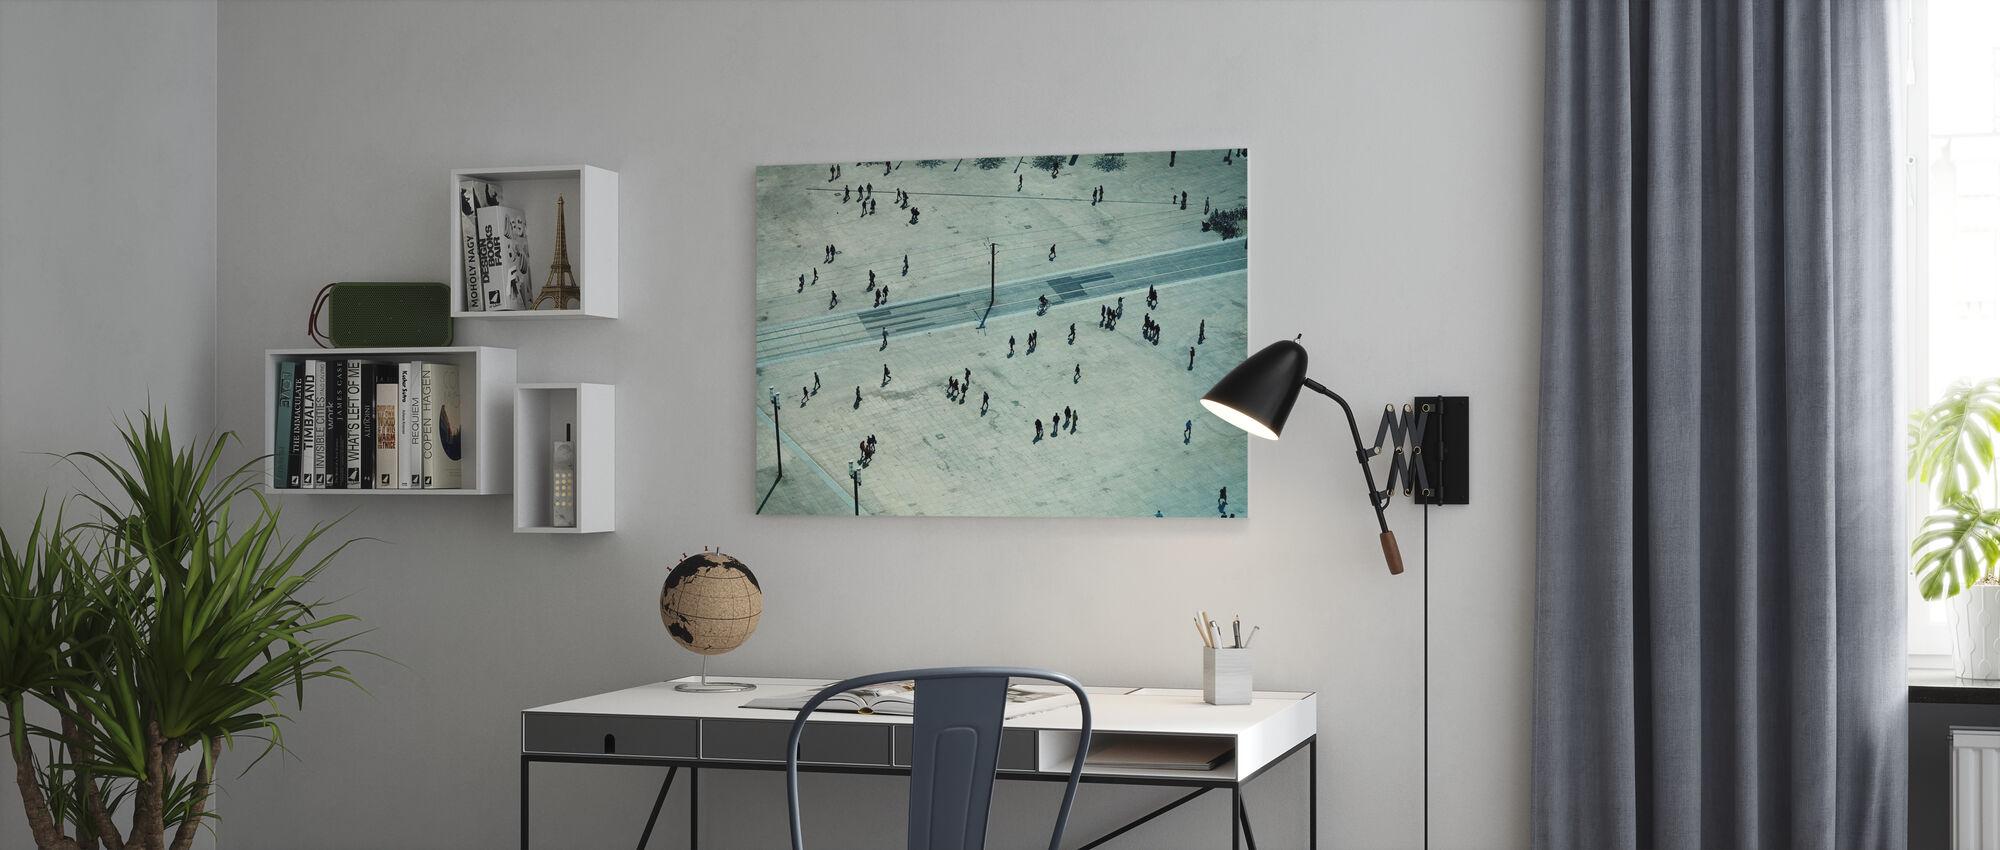 People in Alexanderplatz, Berlin - Canvas print - Office